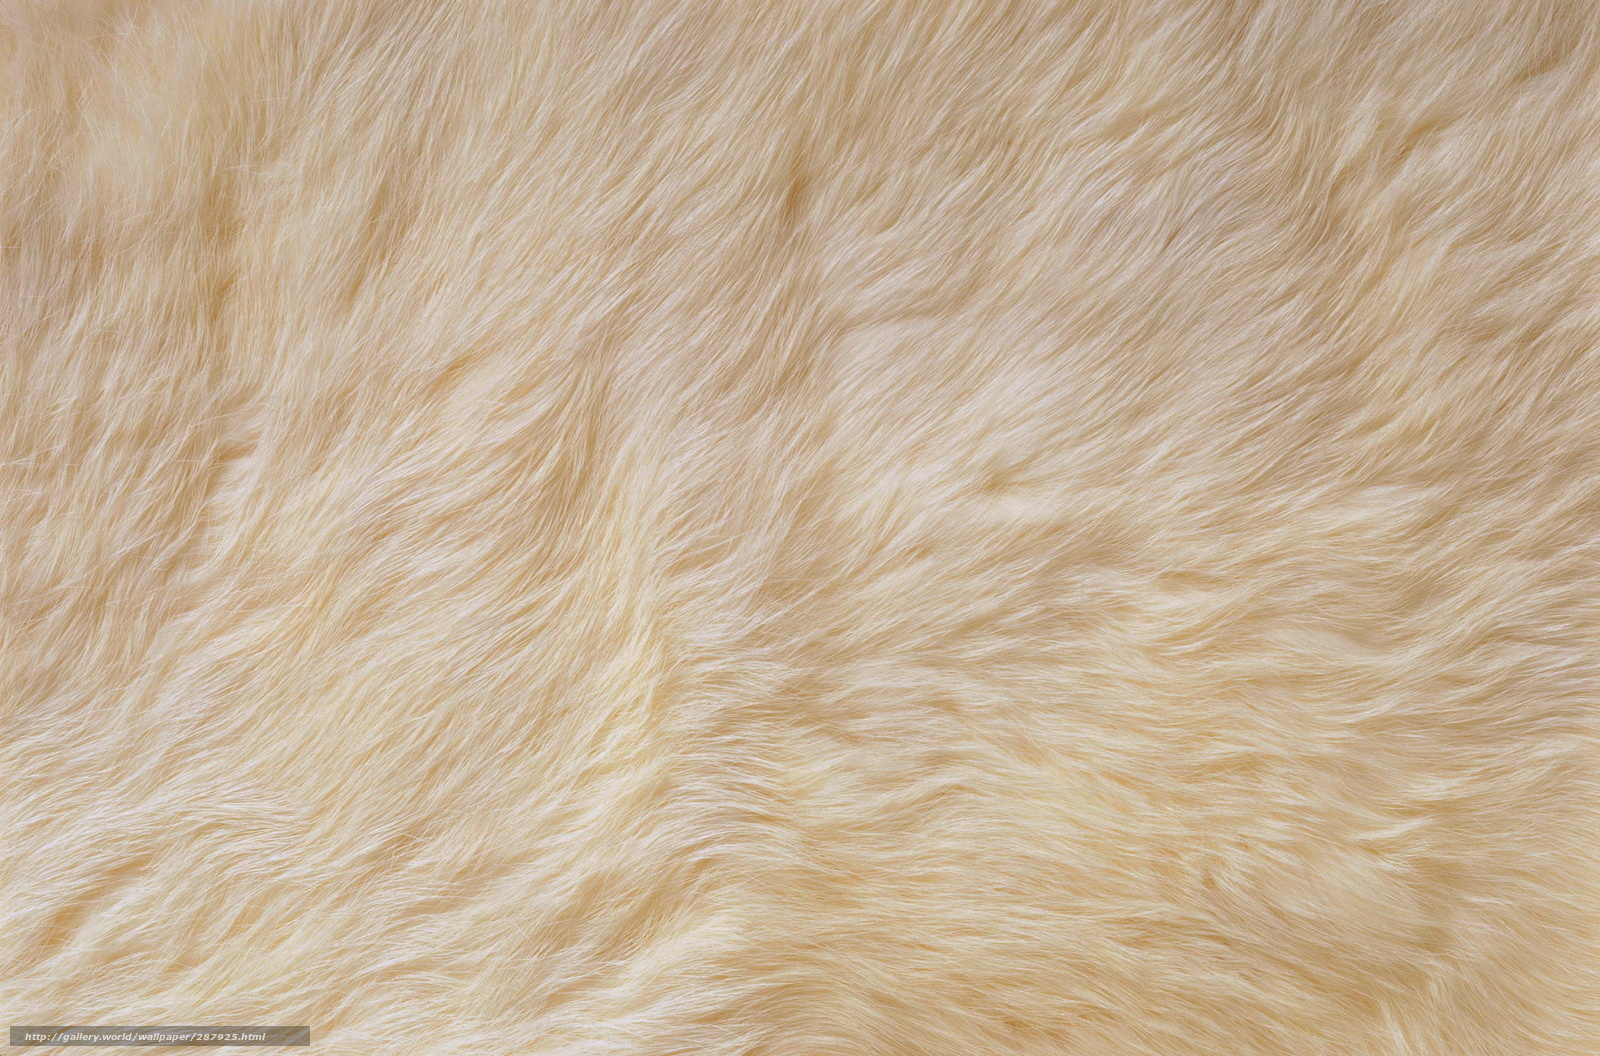 Download wallpaper white fur Textures skin desktop wallpaper in 1600x1056